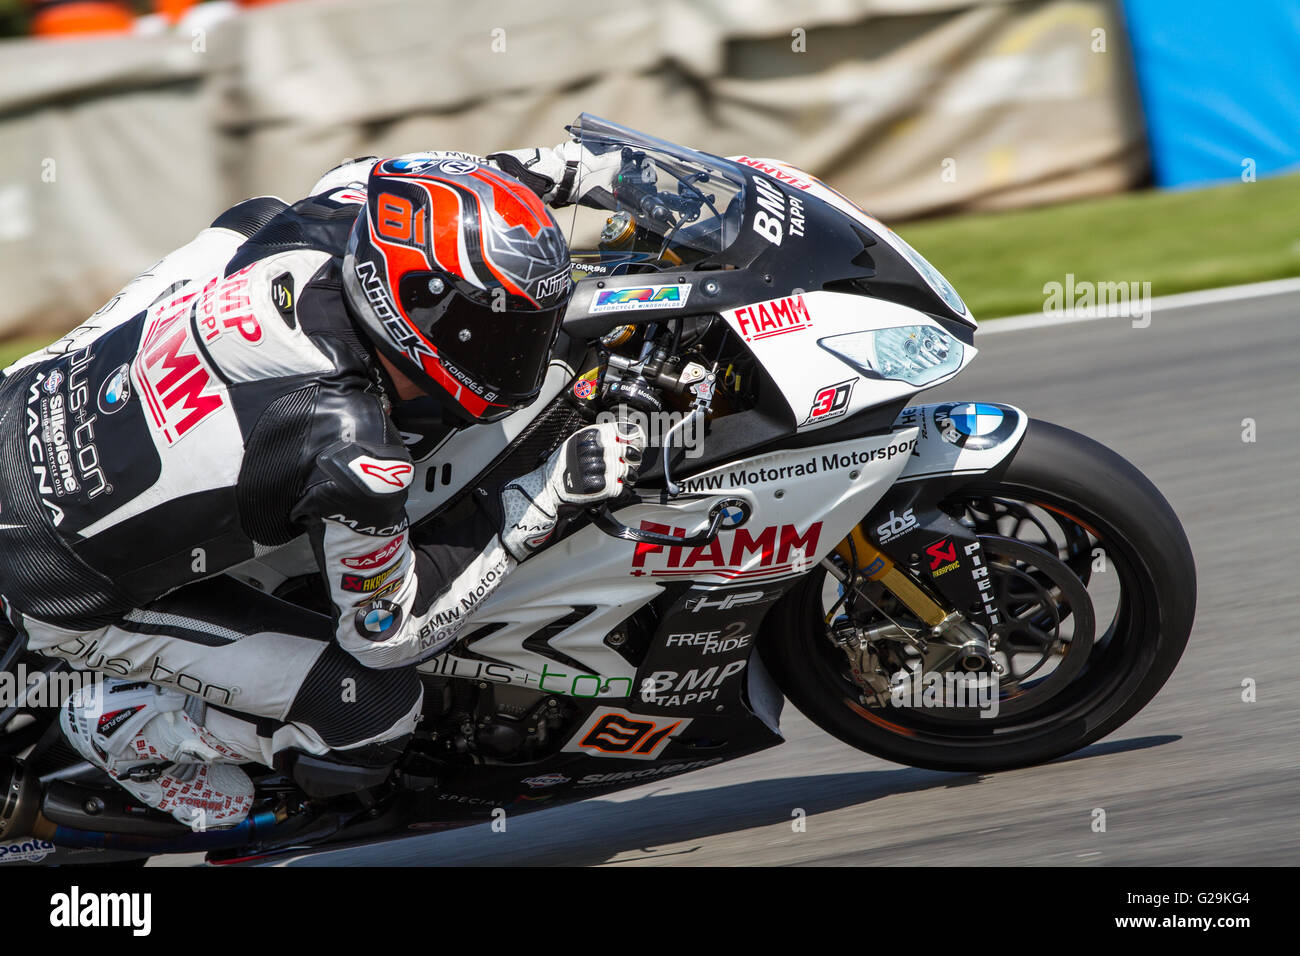 Donington Park, UK. 27th May, 2016. World Superbikes Acerbis UK Round 7 at Donington Park. #81 Jordi Torres -  Team Stock Photo